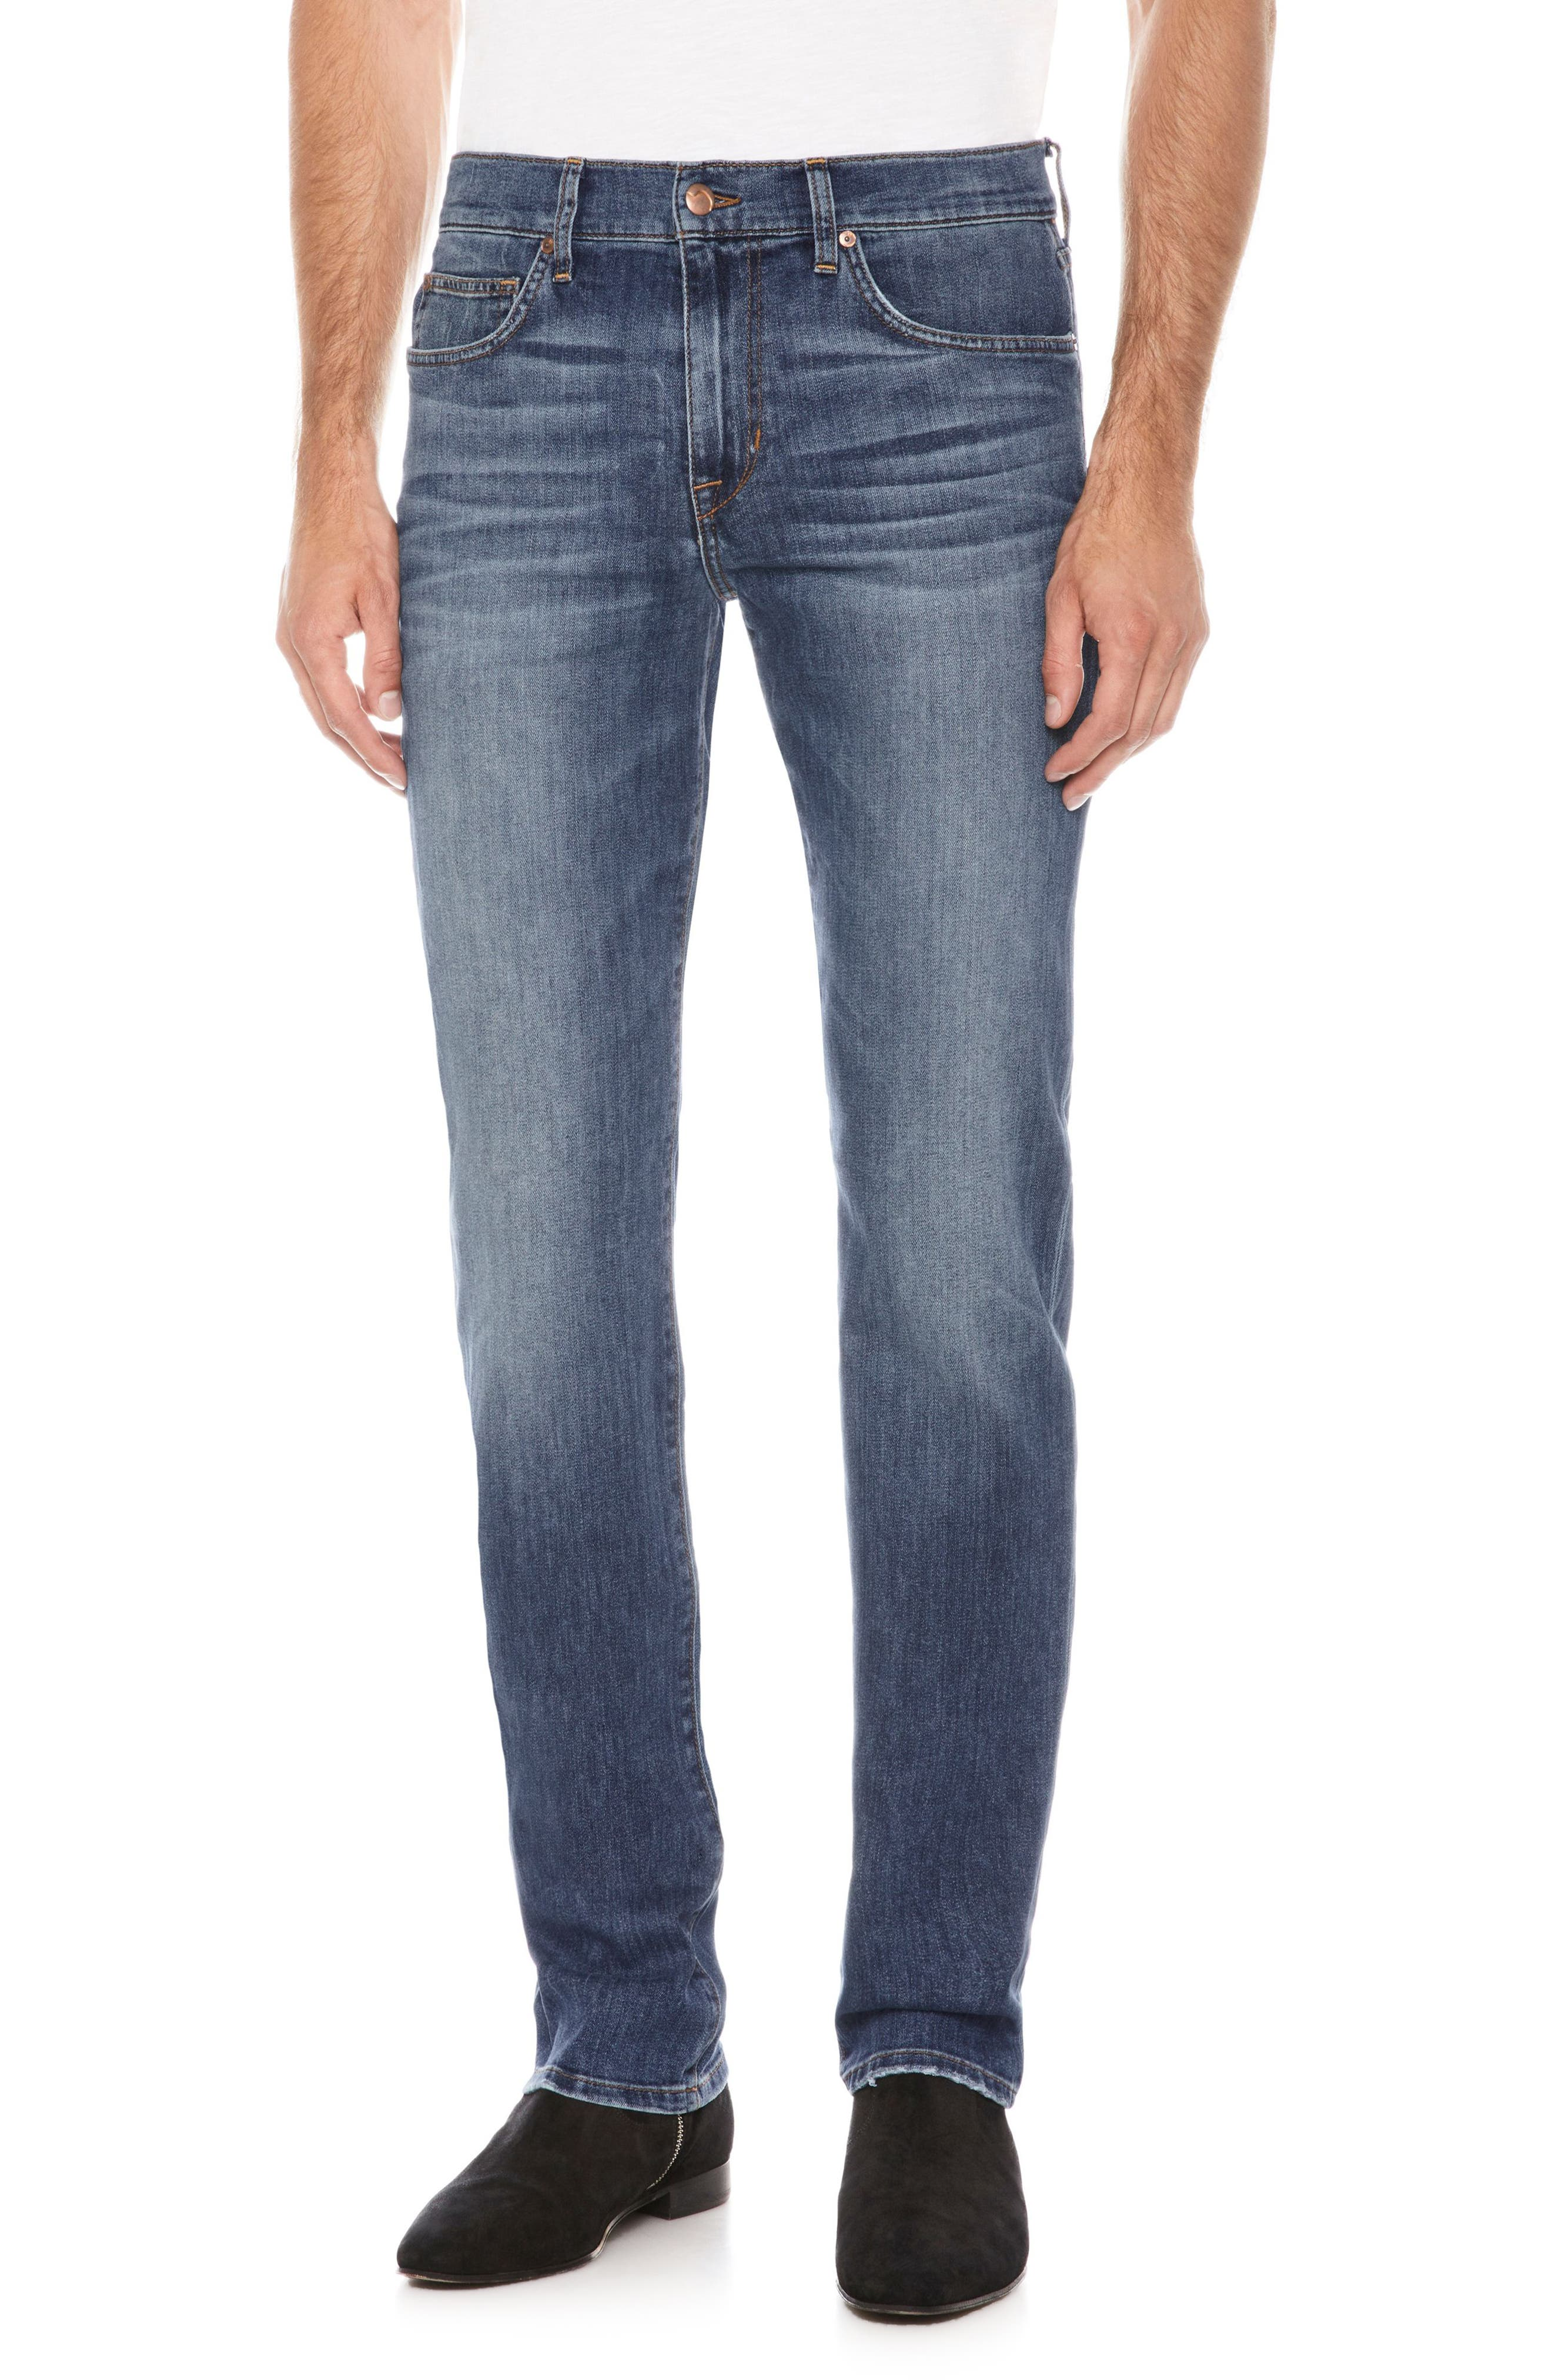 Main Image - Joe's Folsom Slim Fit Jeans (Freeman)